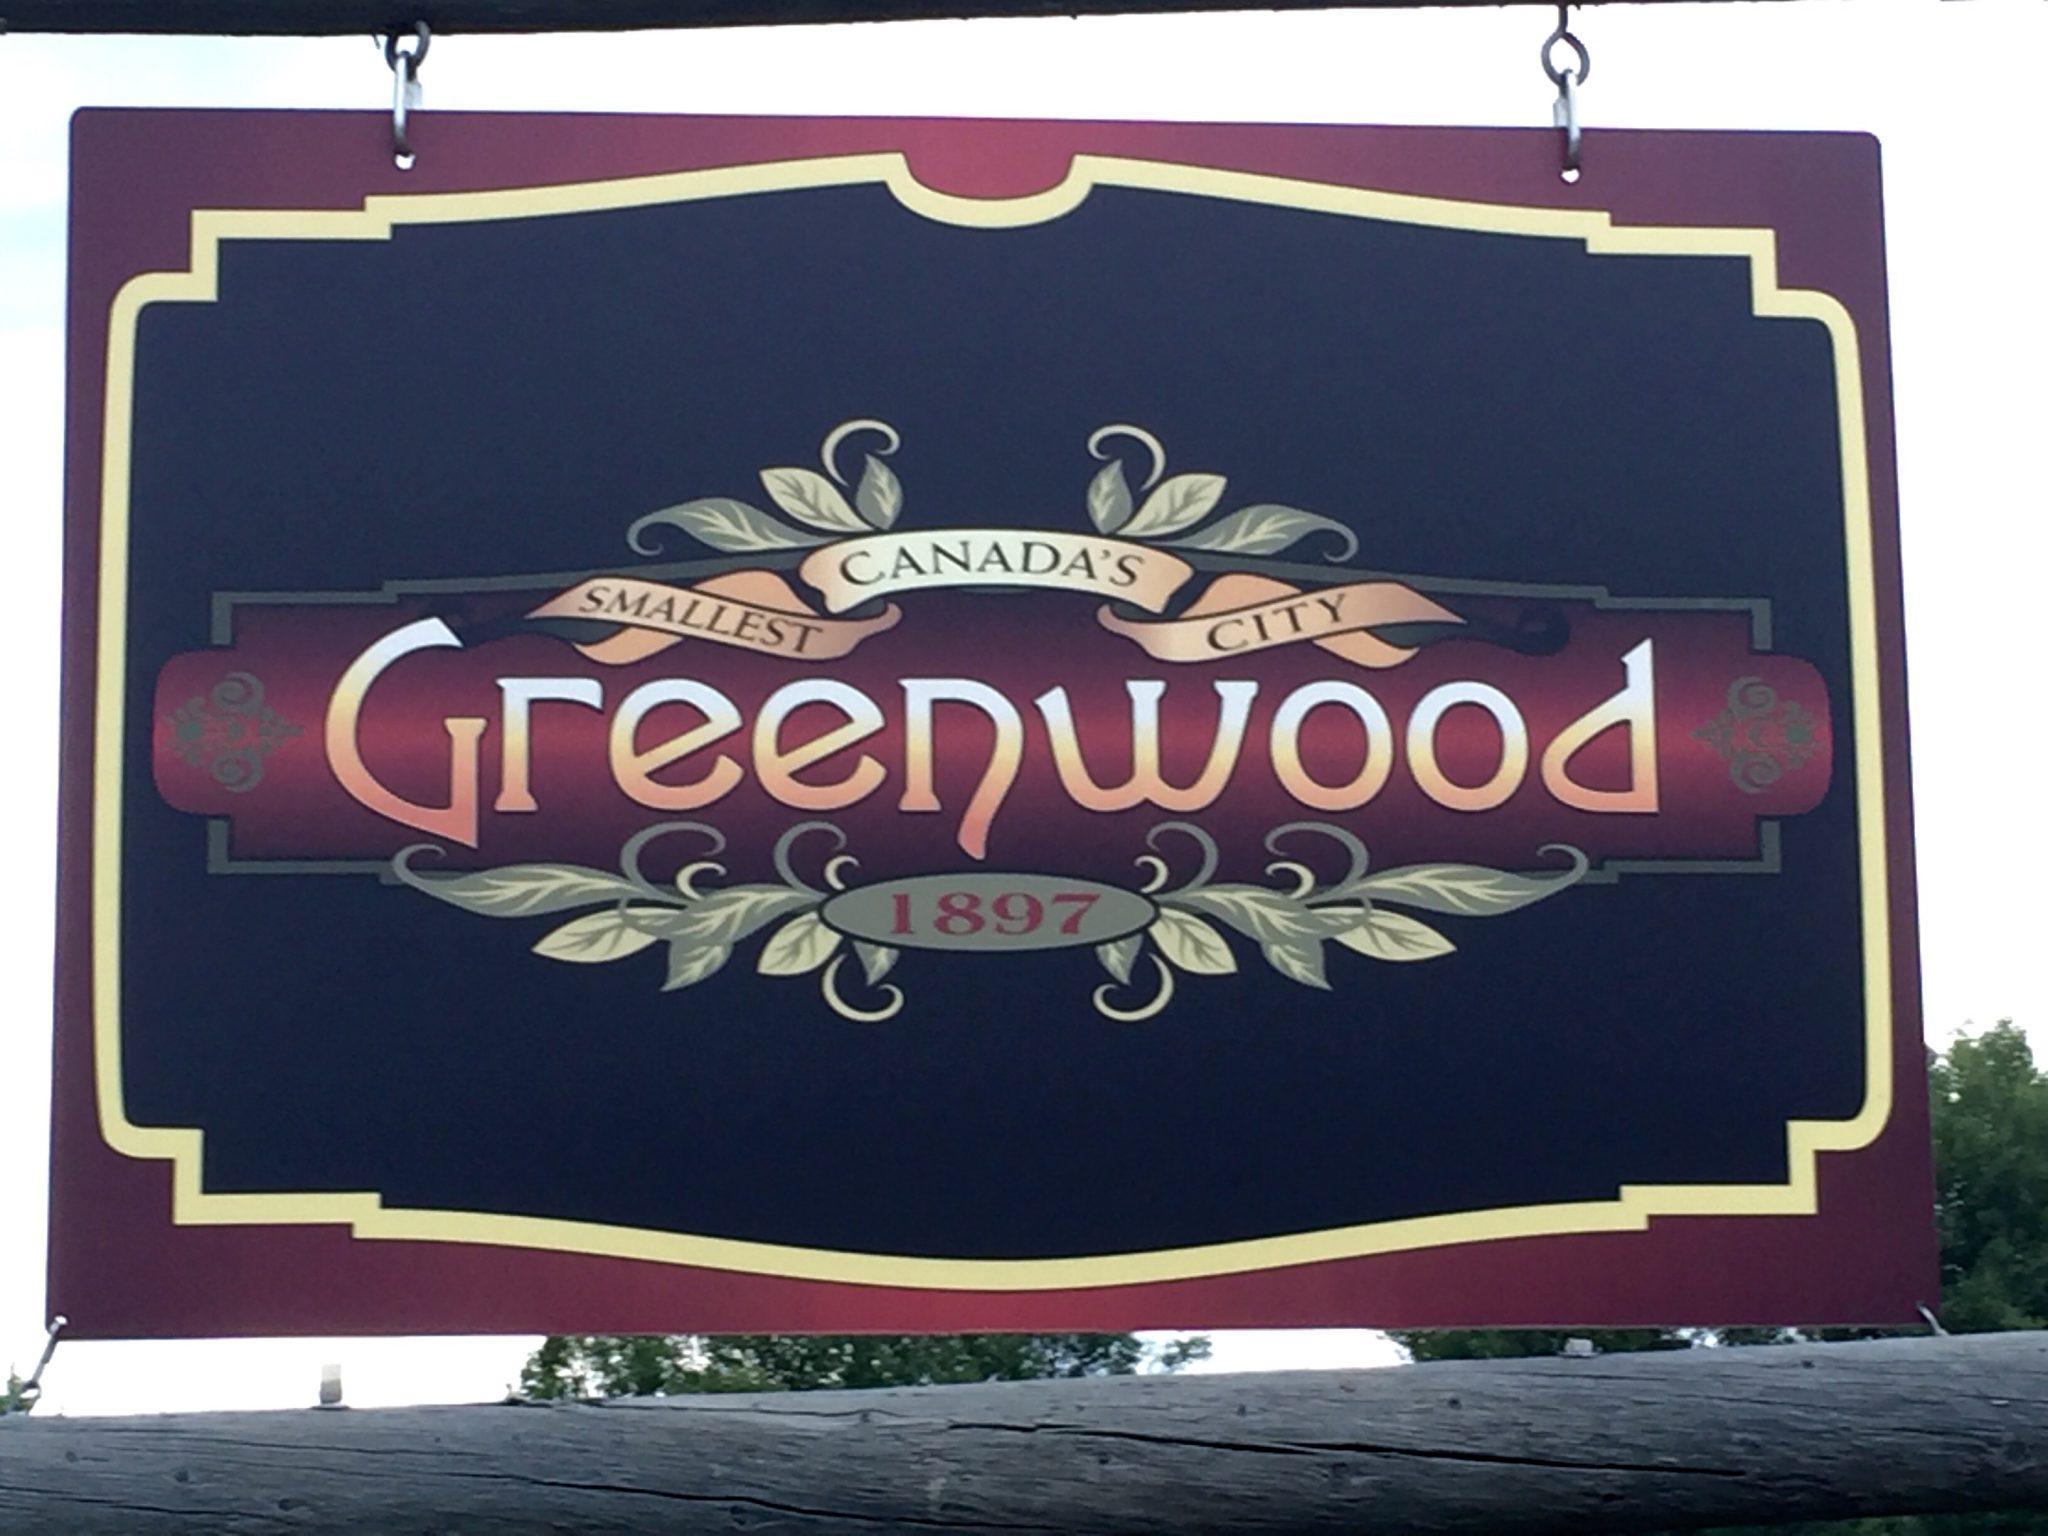 Greenwood, Canada